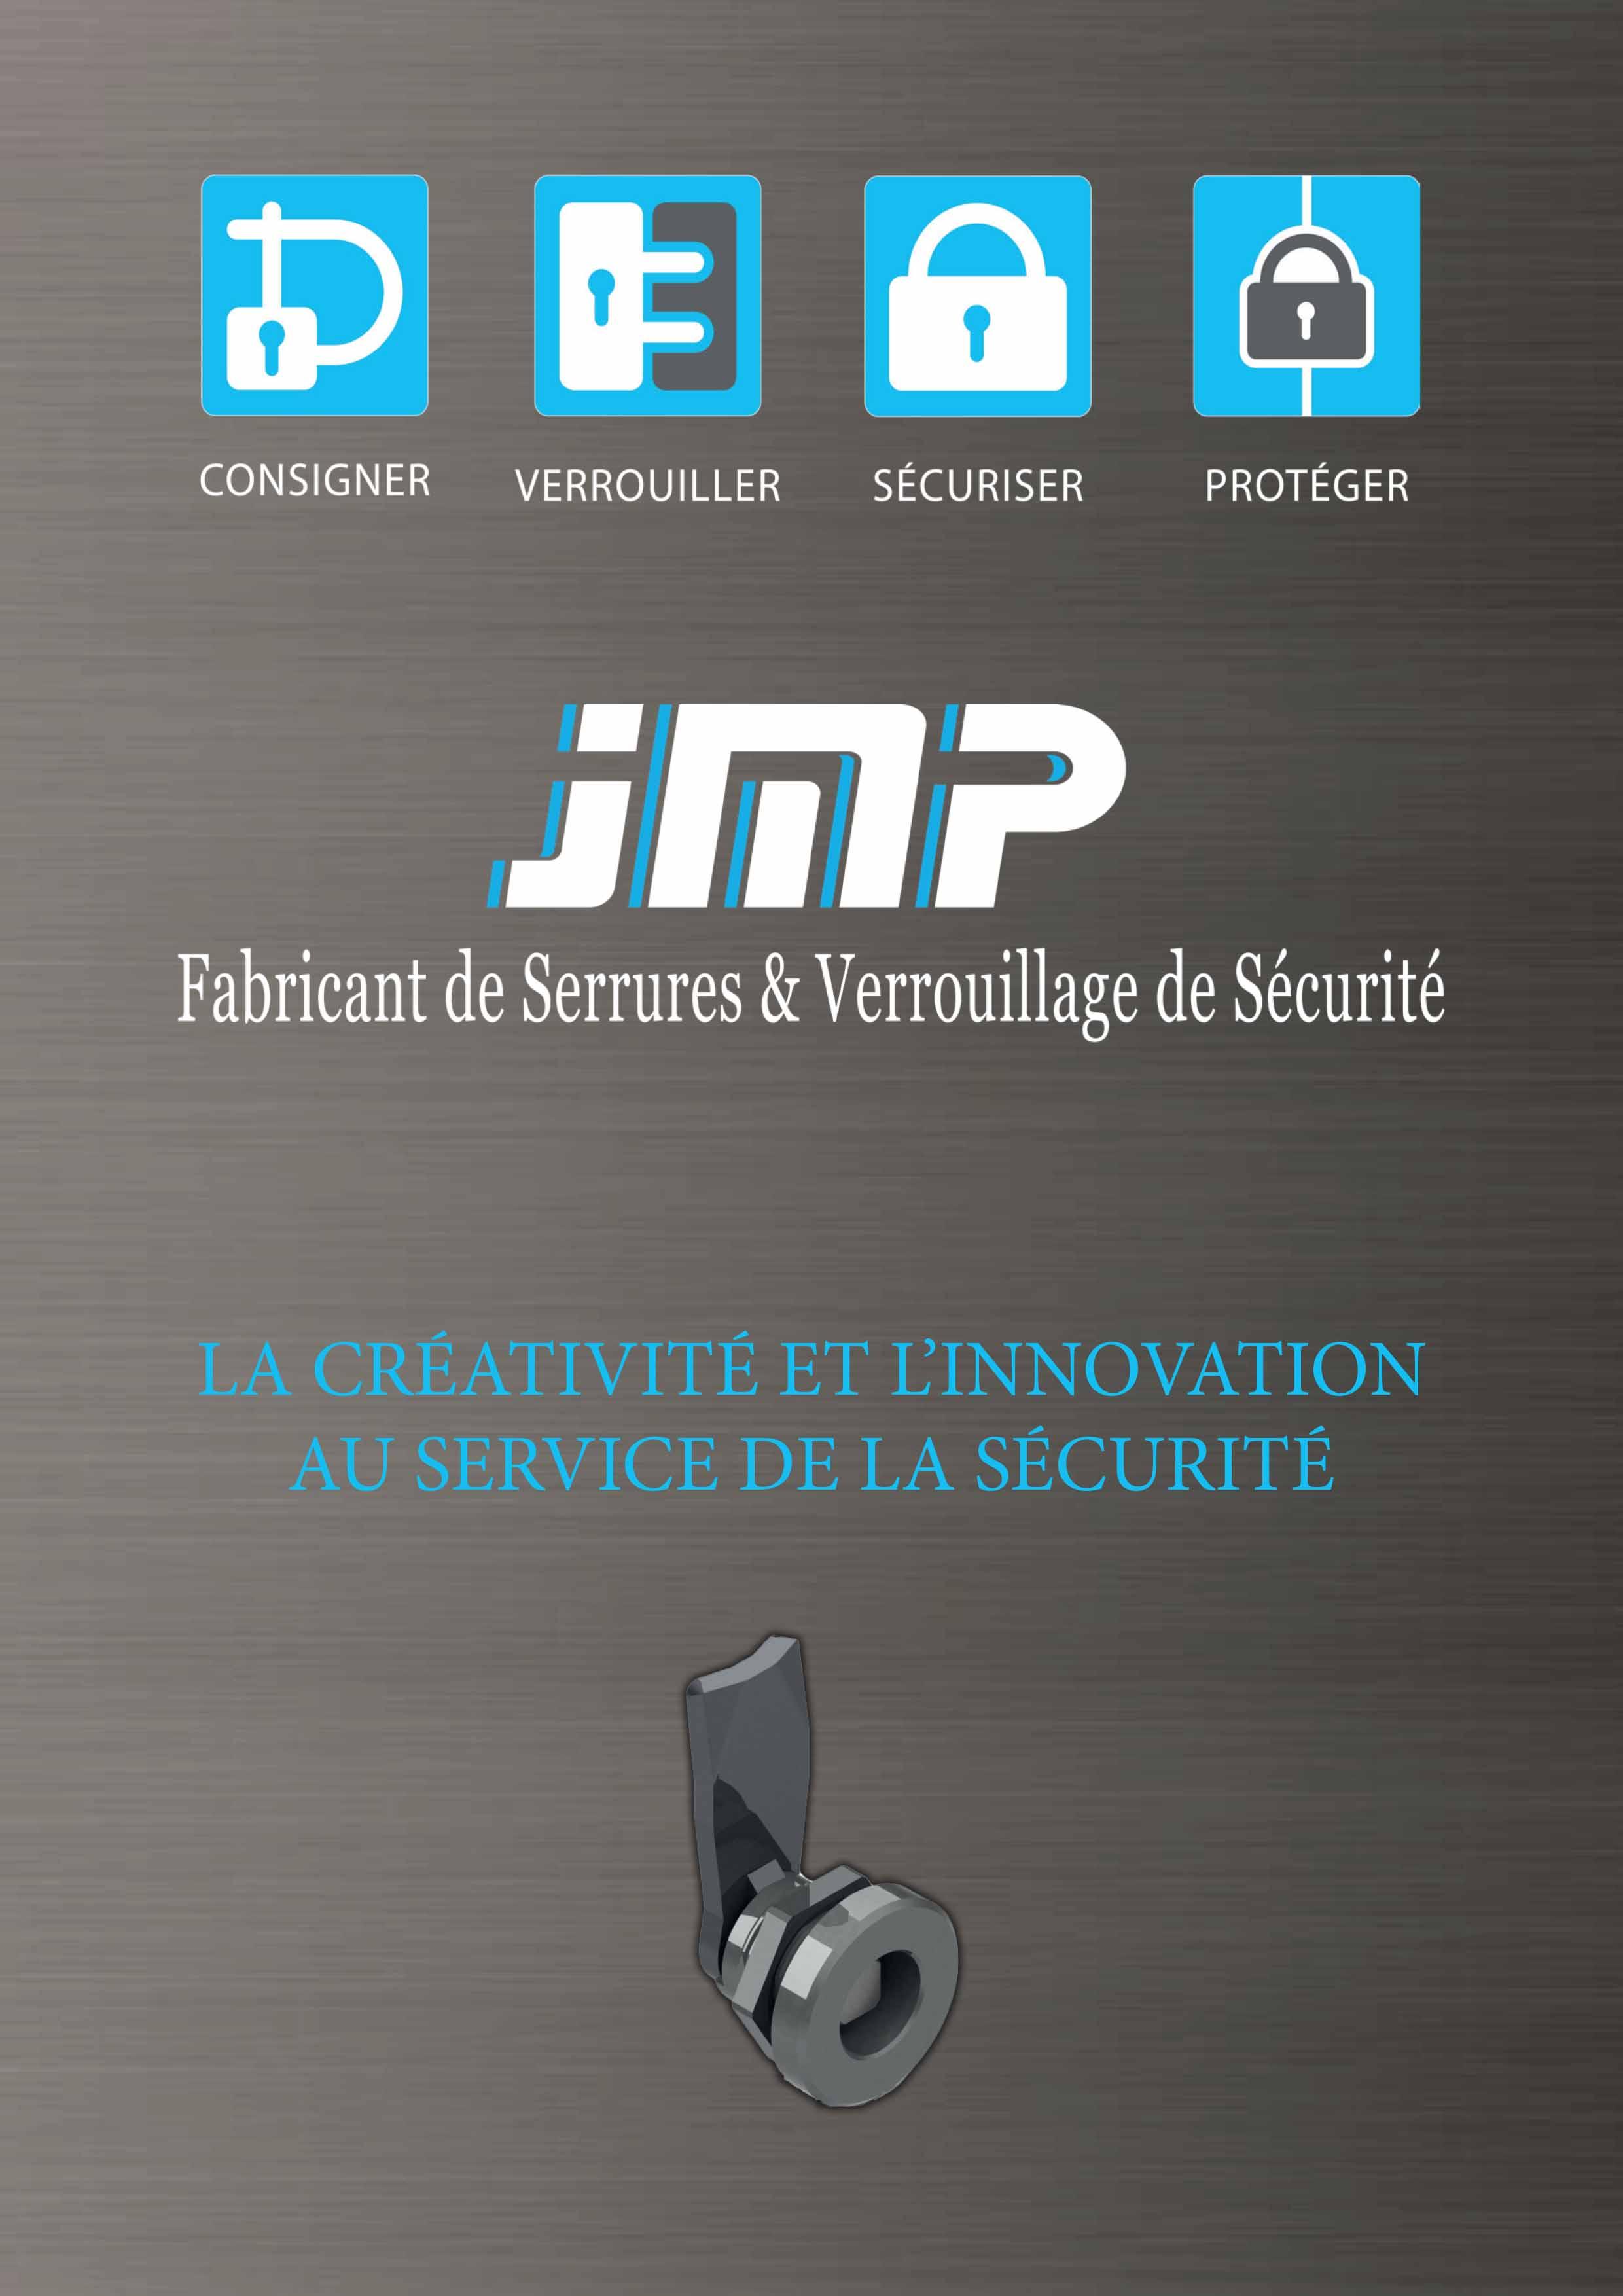 Plaquette-fabricant-serrure-verrouillage-sécurité-JMP-1.jpg